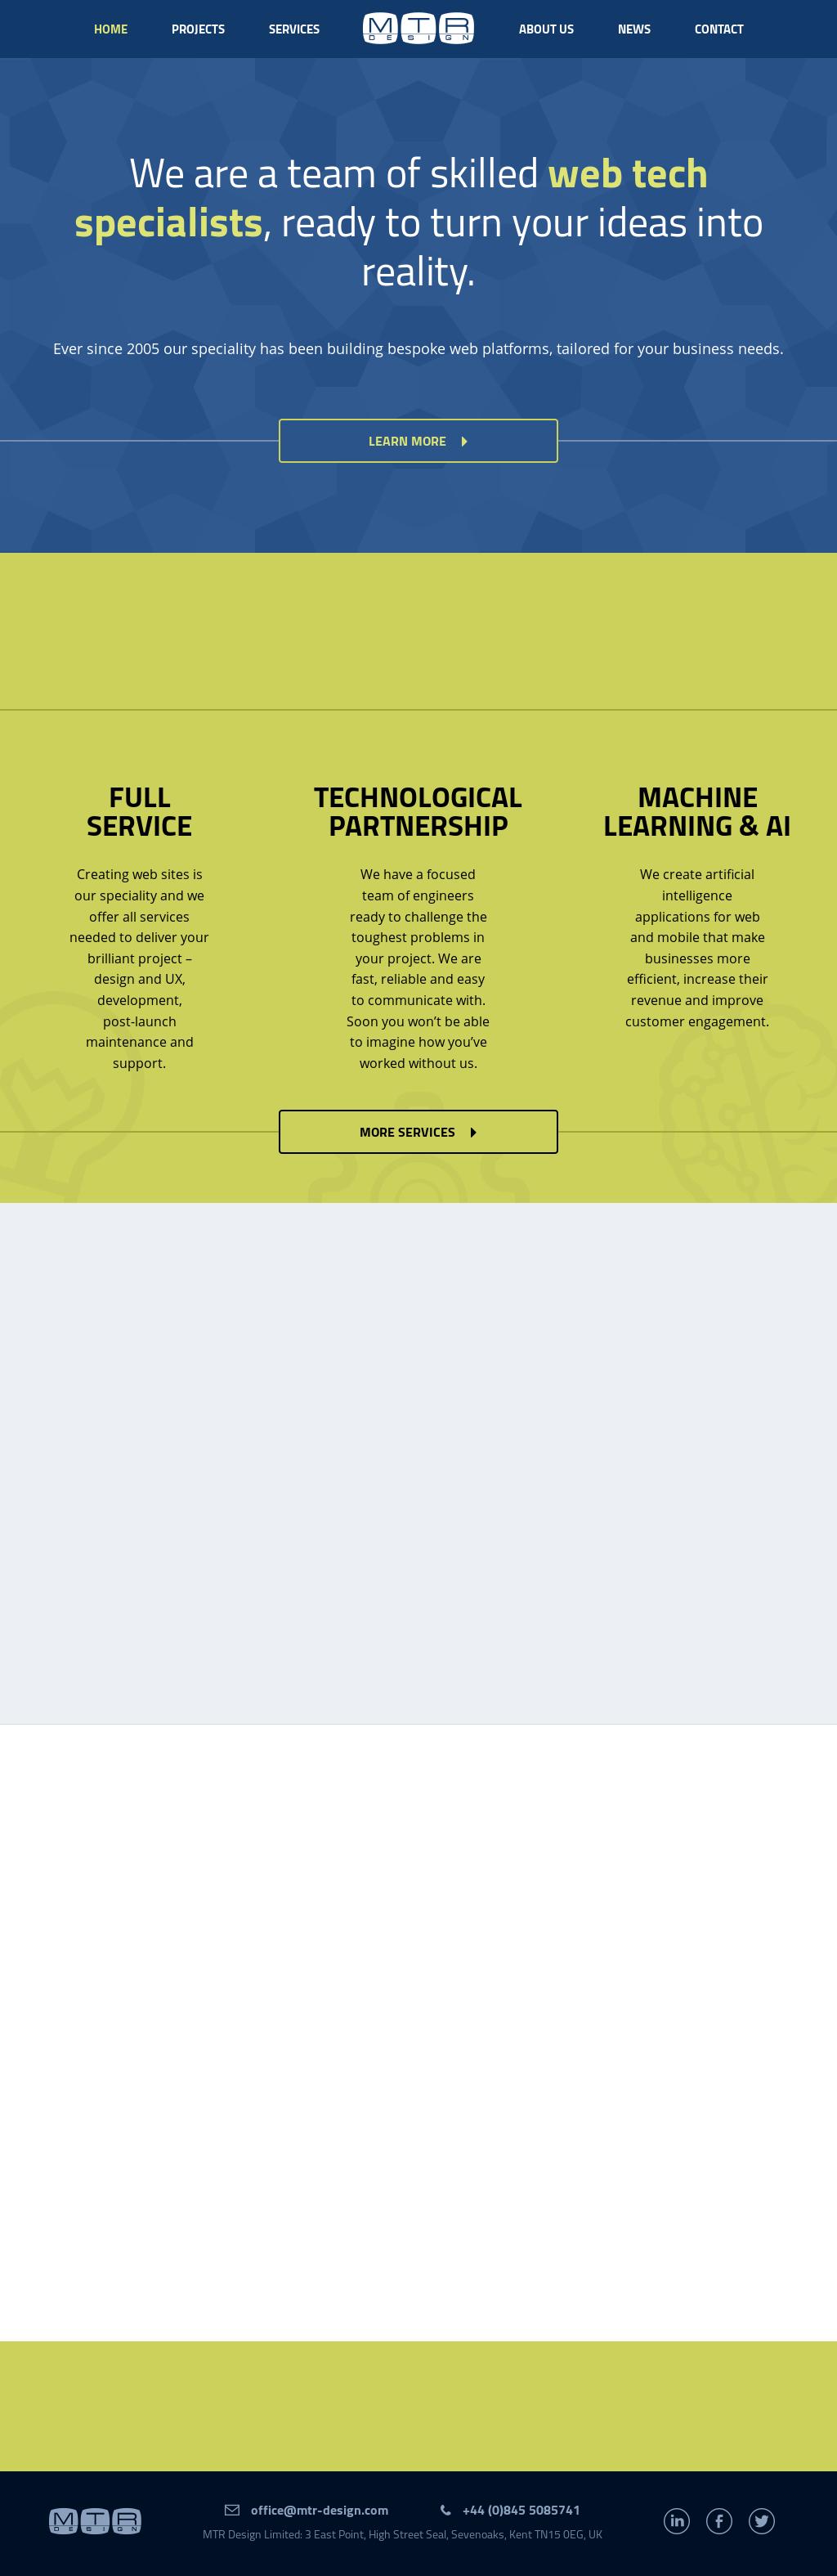 Owler Reports - Mtr Design Blog SAP Jam SAML Authentication Using Python